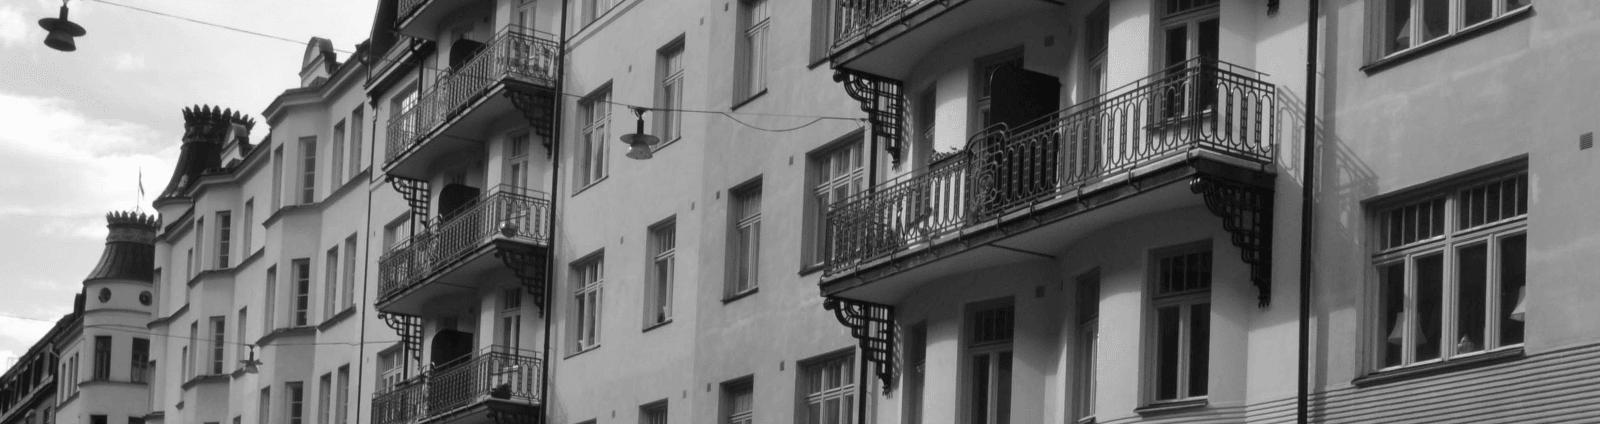 Kontorshotell Kungsholmen